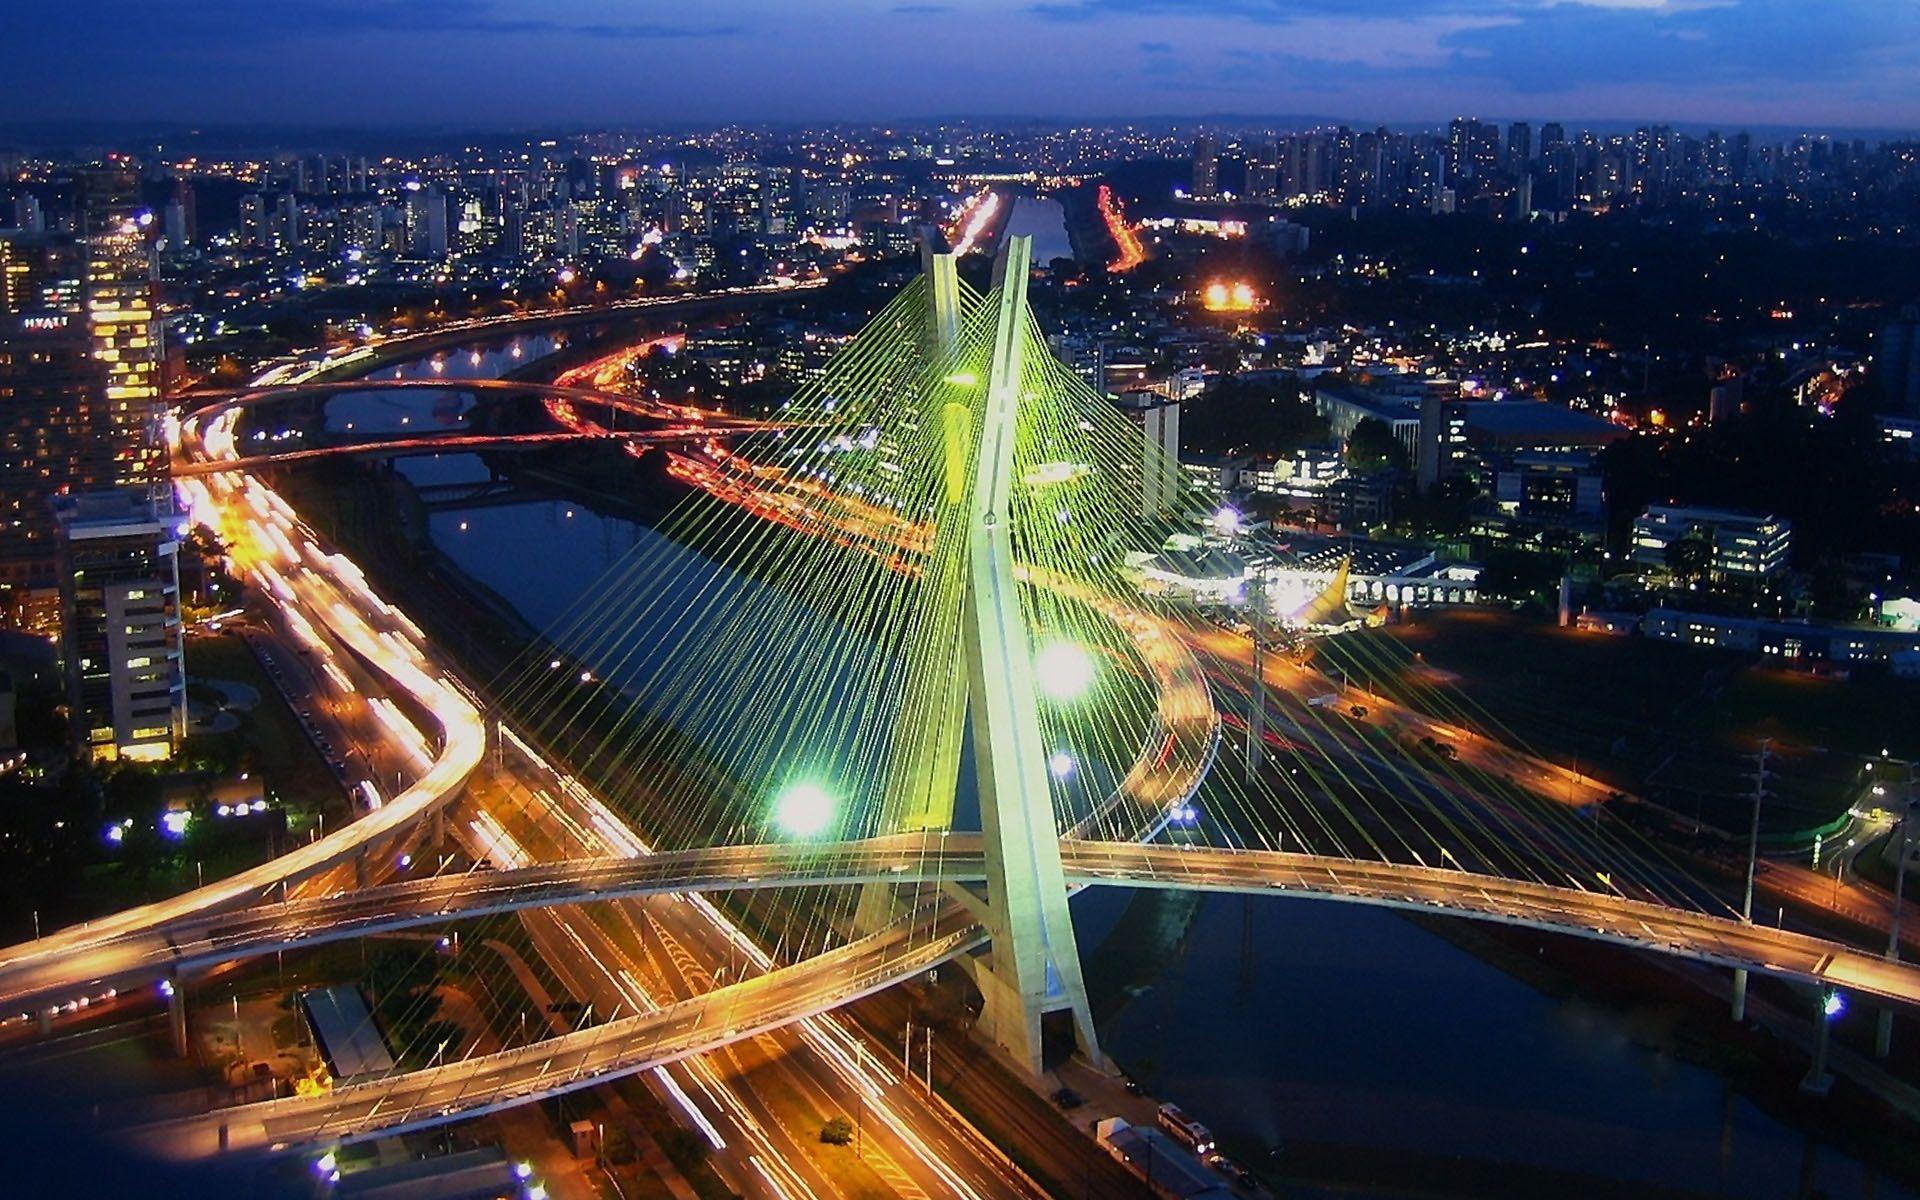 Hotels near Sao Paulo Brazil